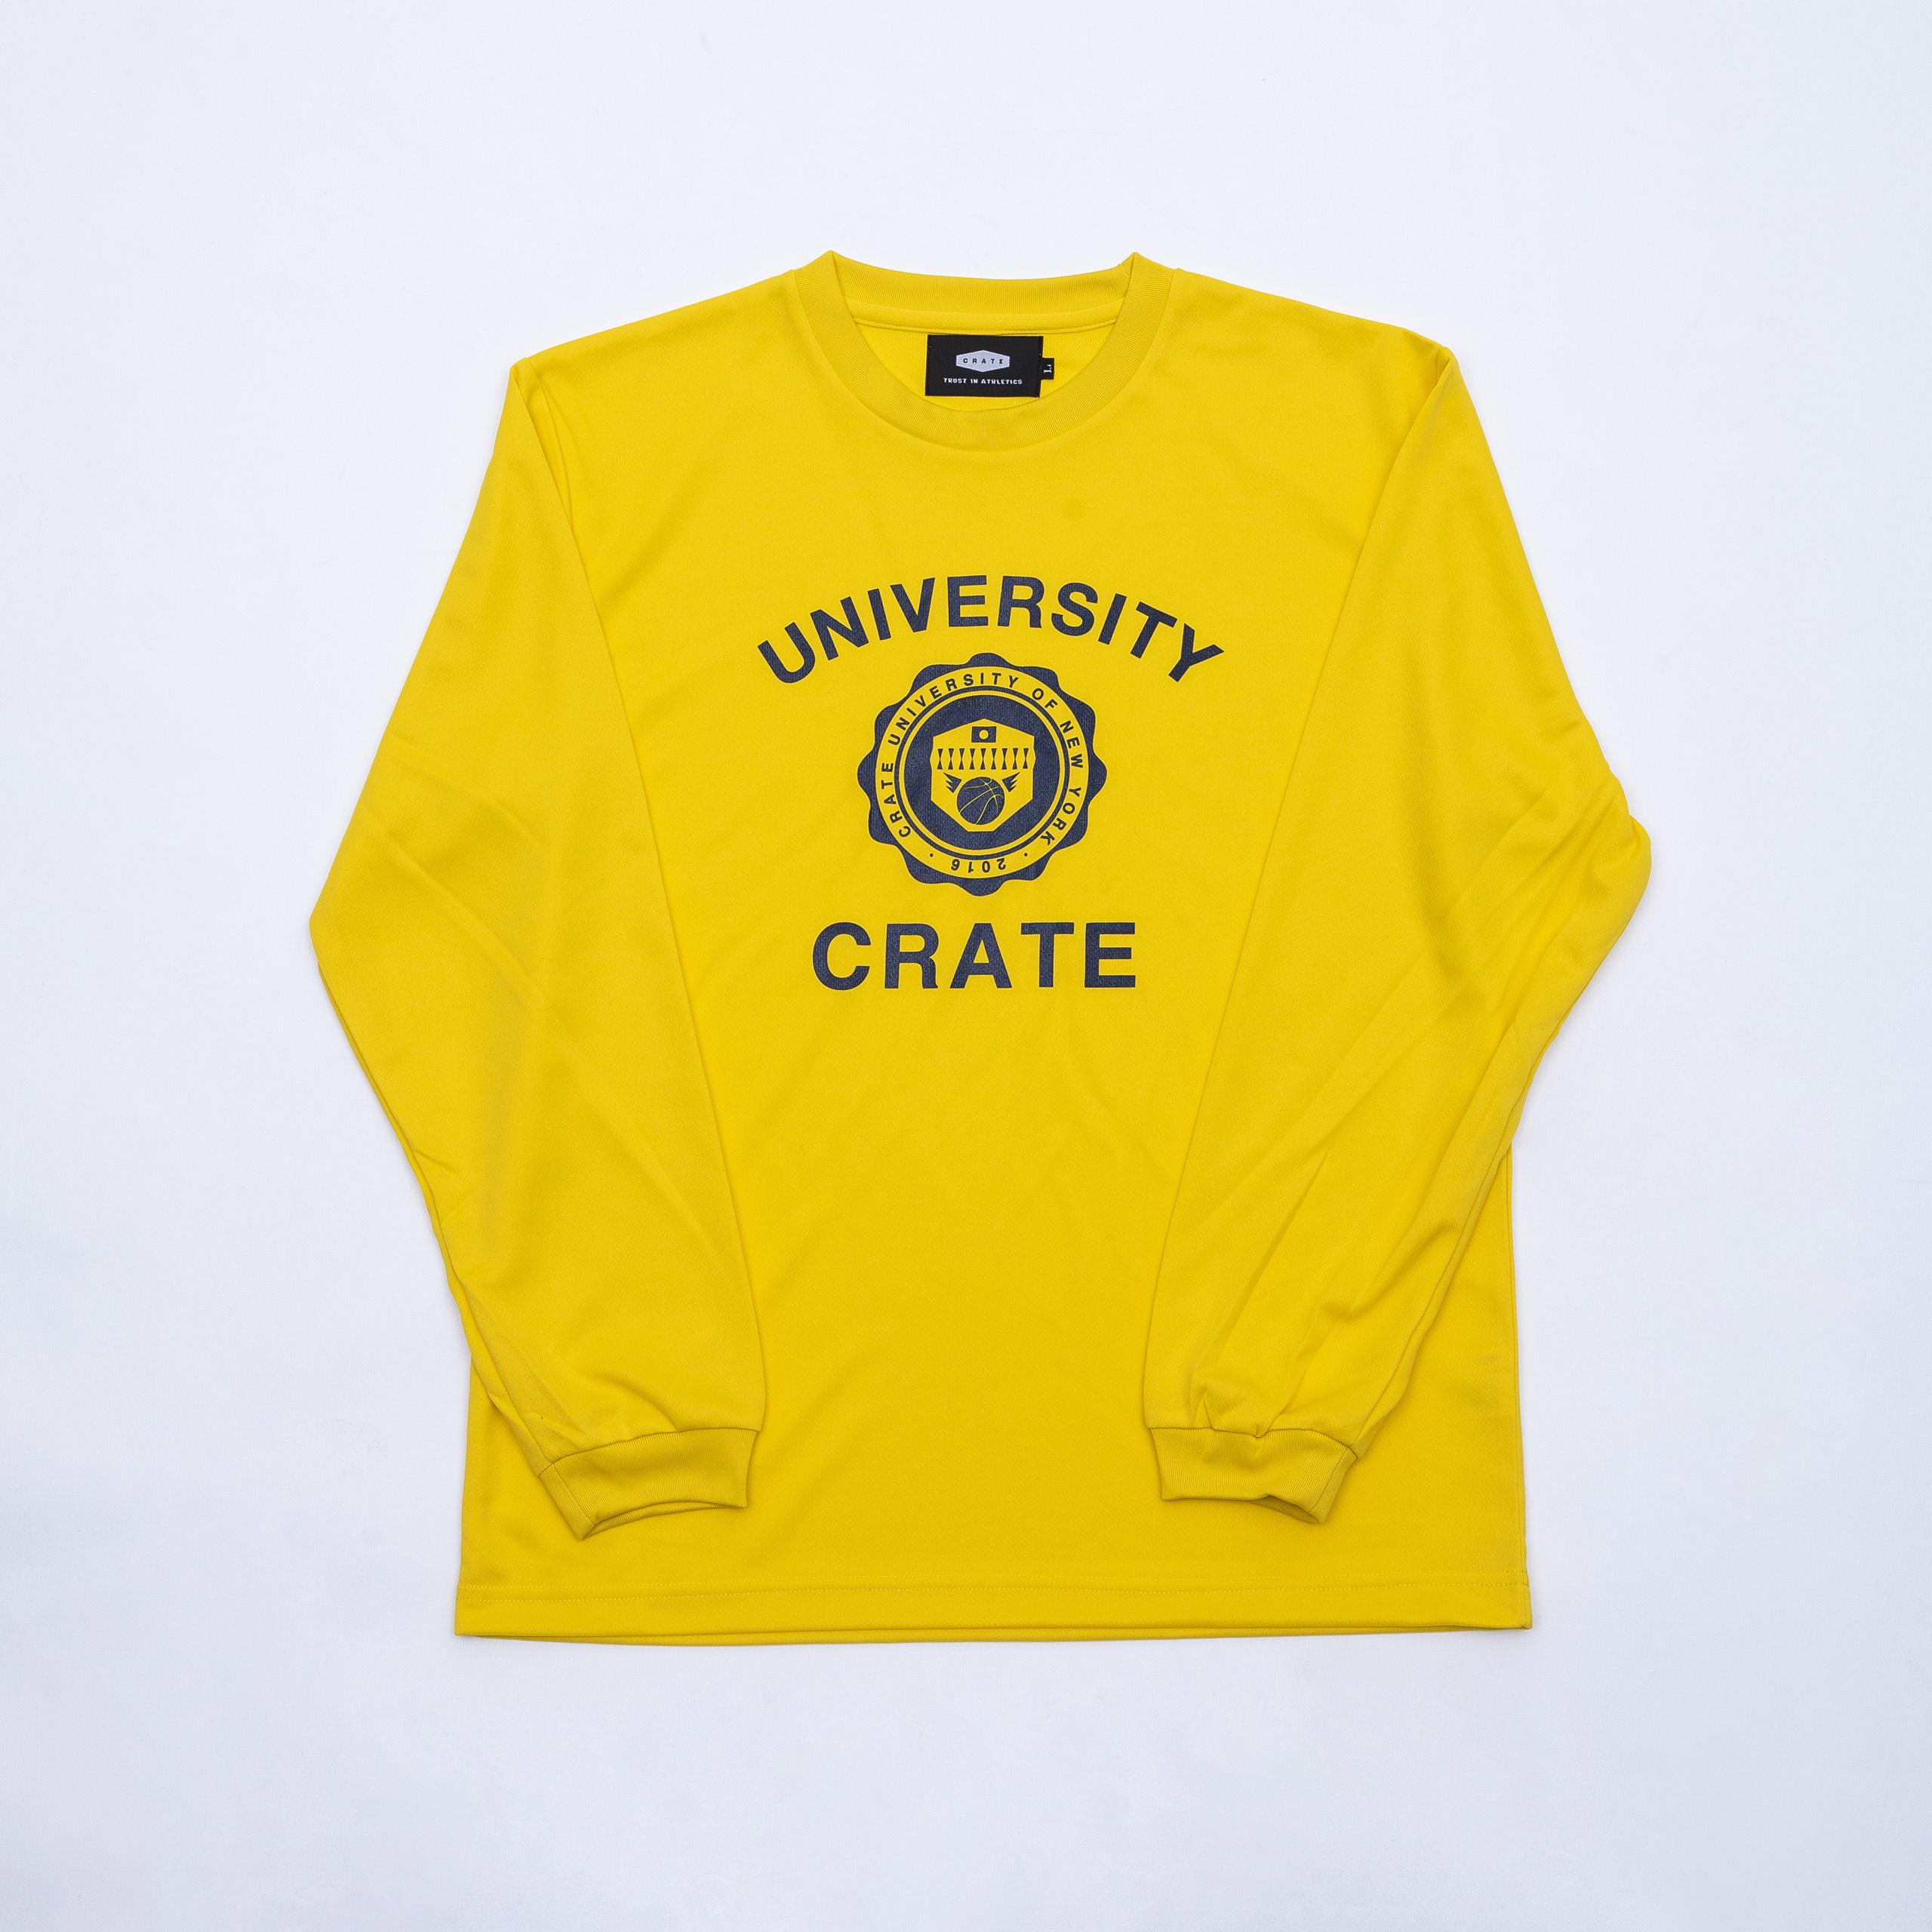 CrateUniversity Mesh L/S Tshirt YELLOW